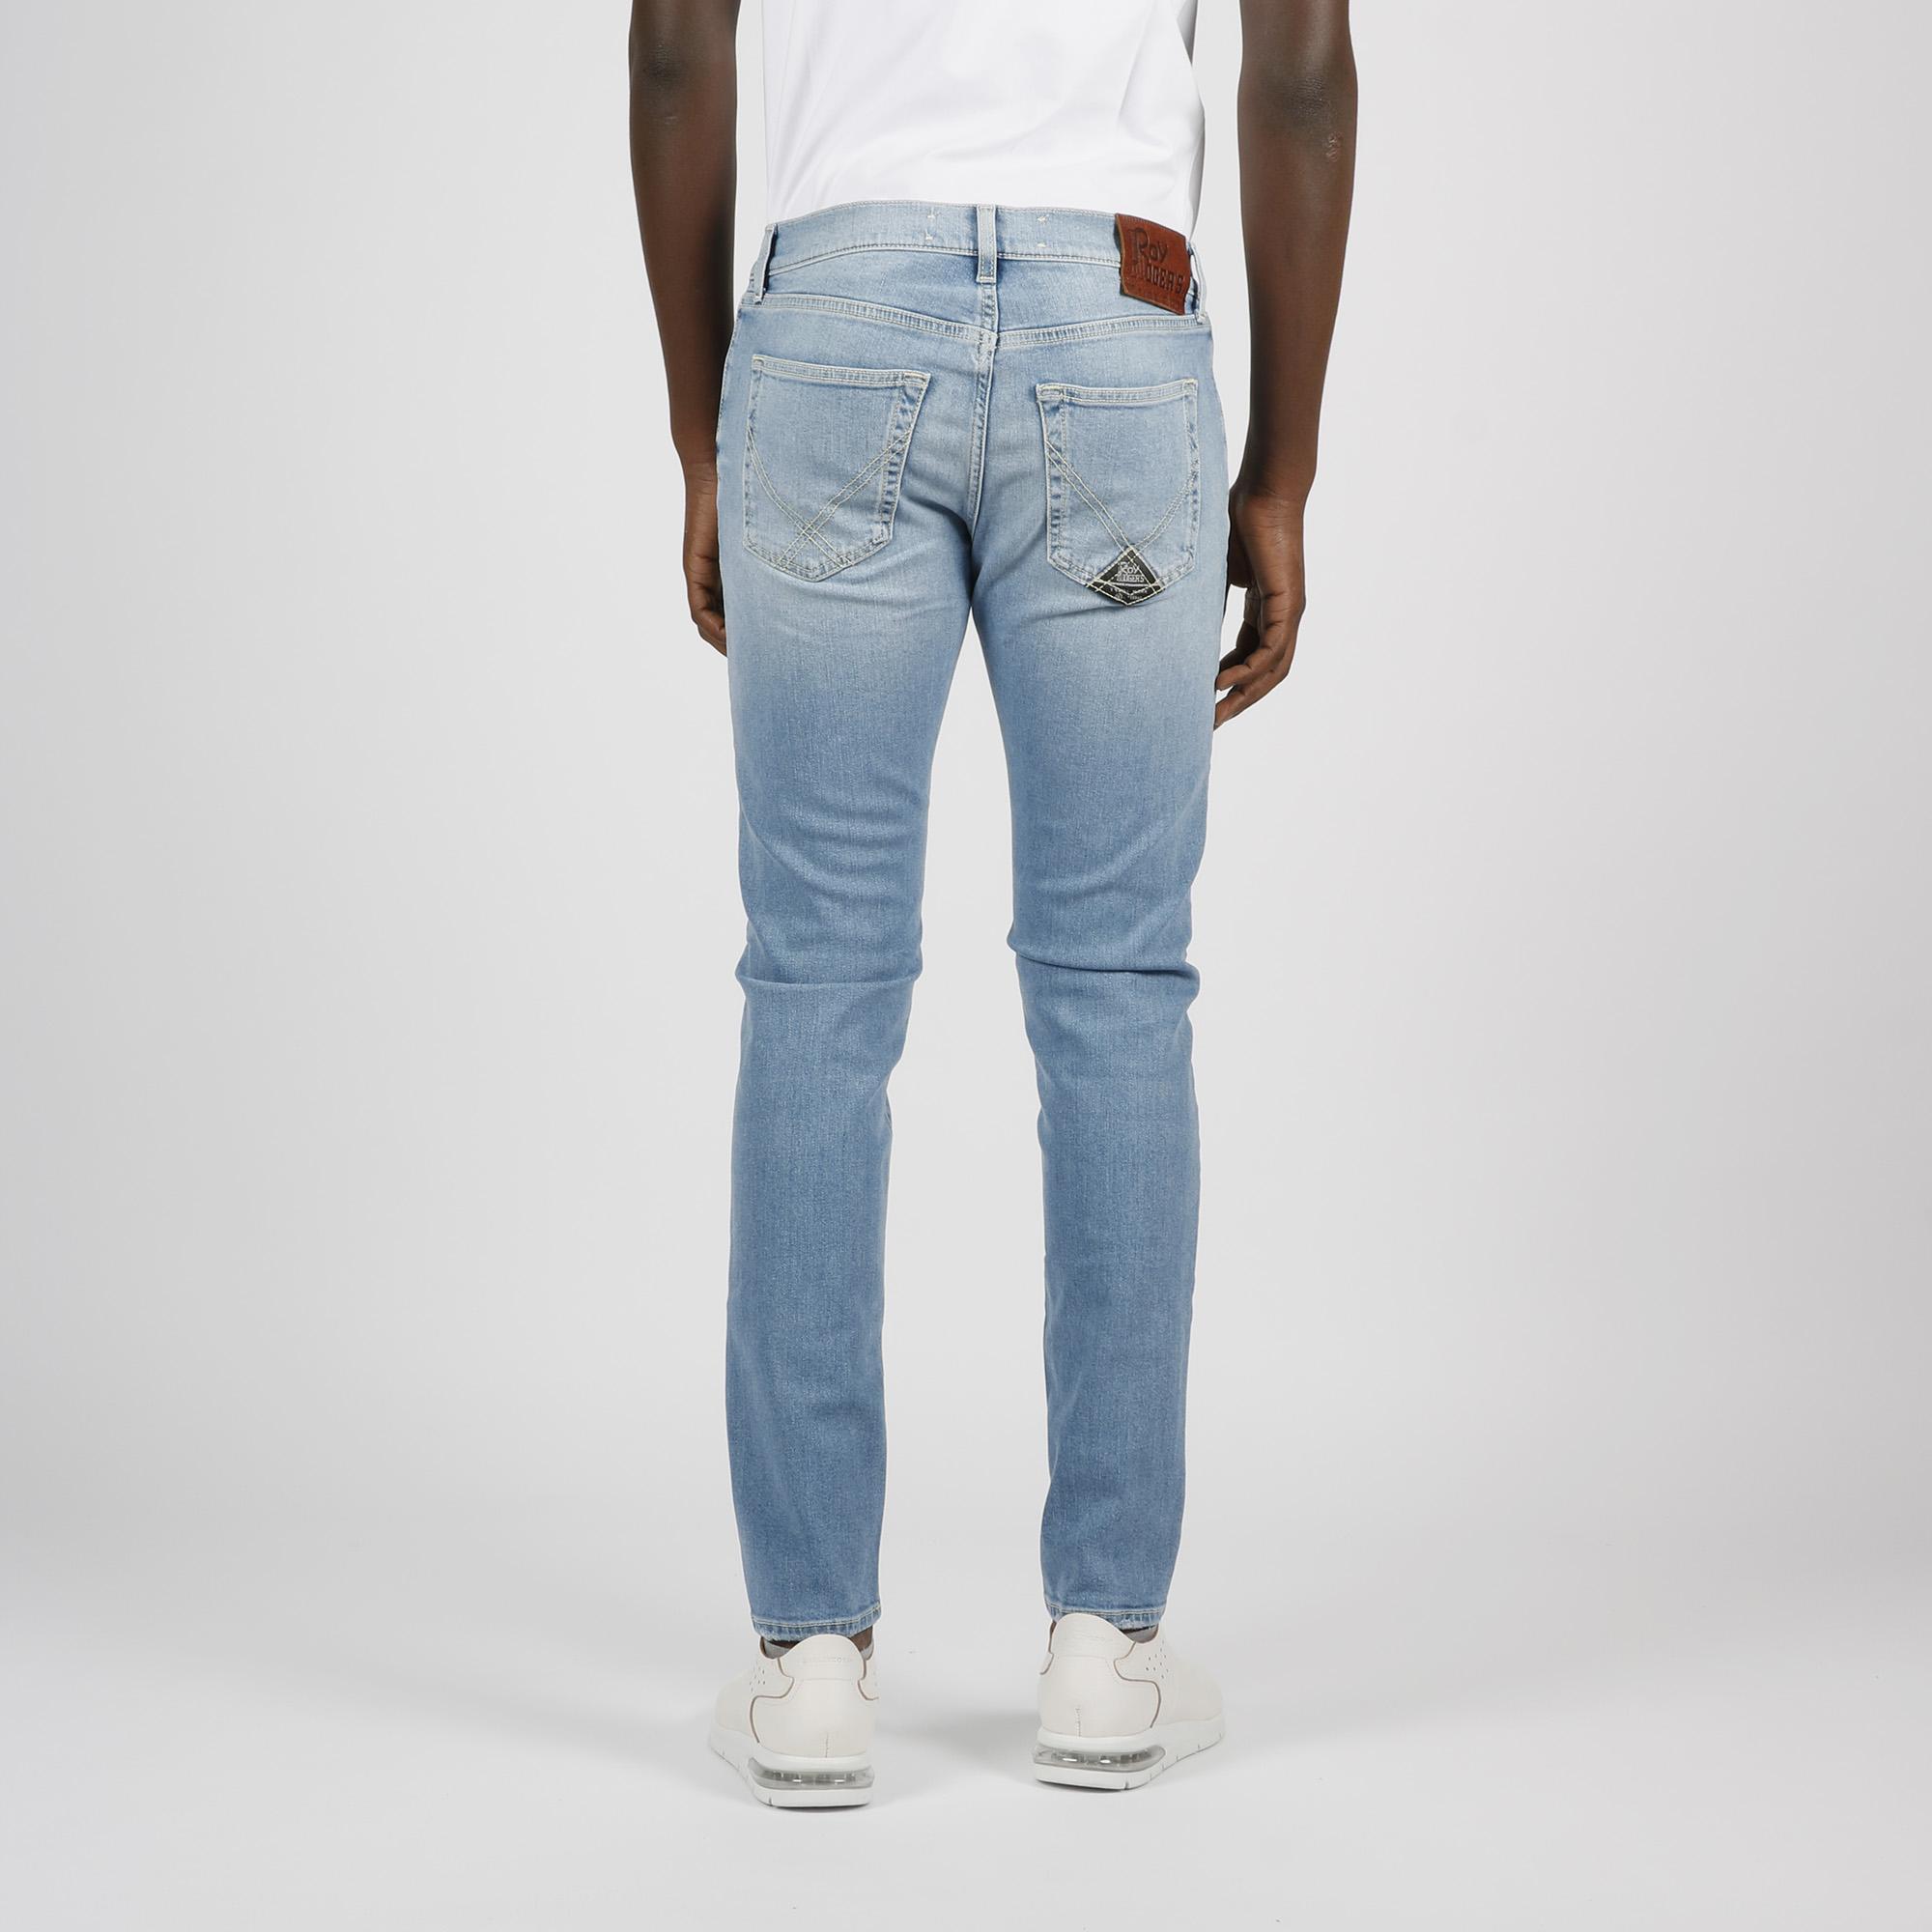 Jeans elias manhattan - Denim